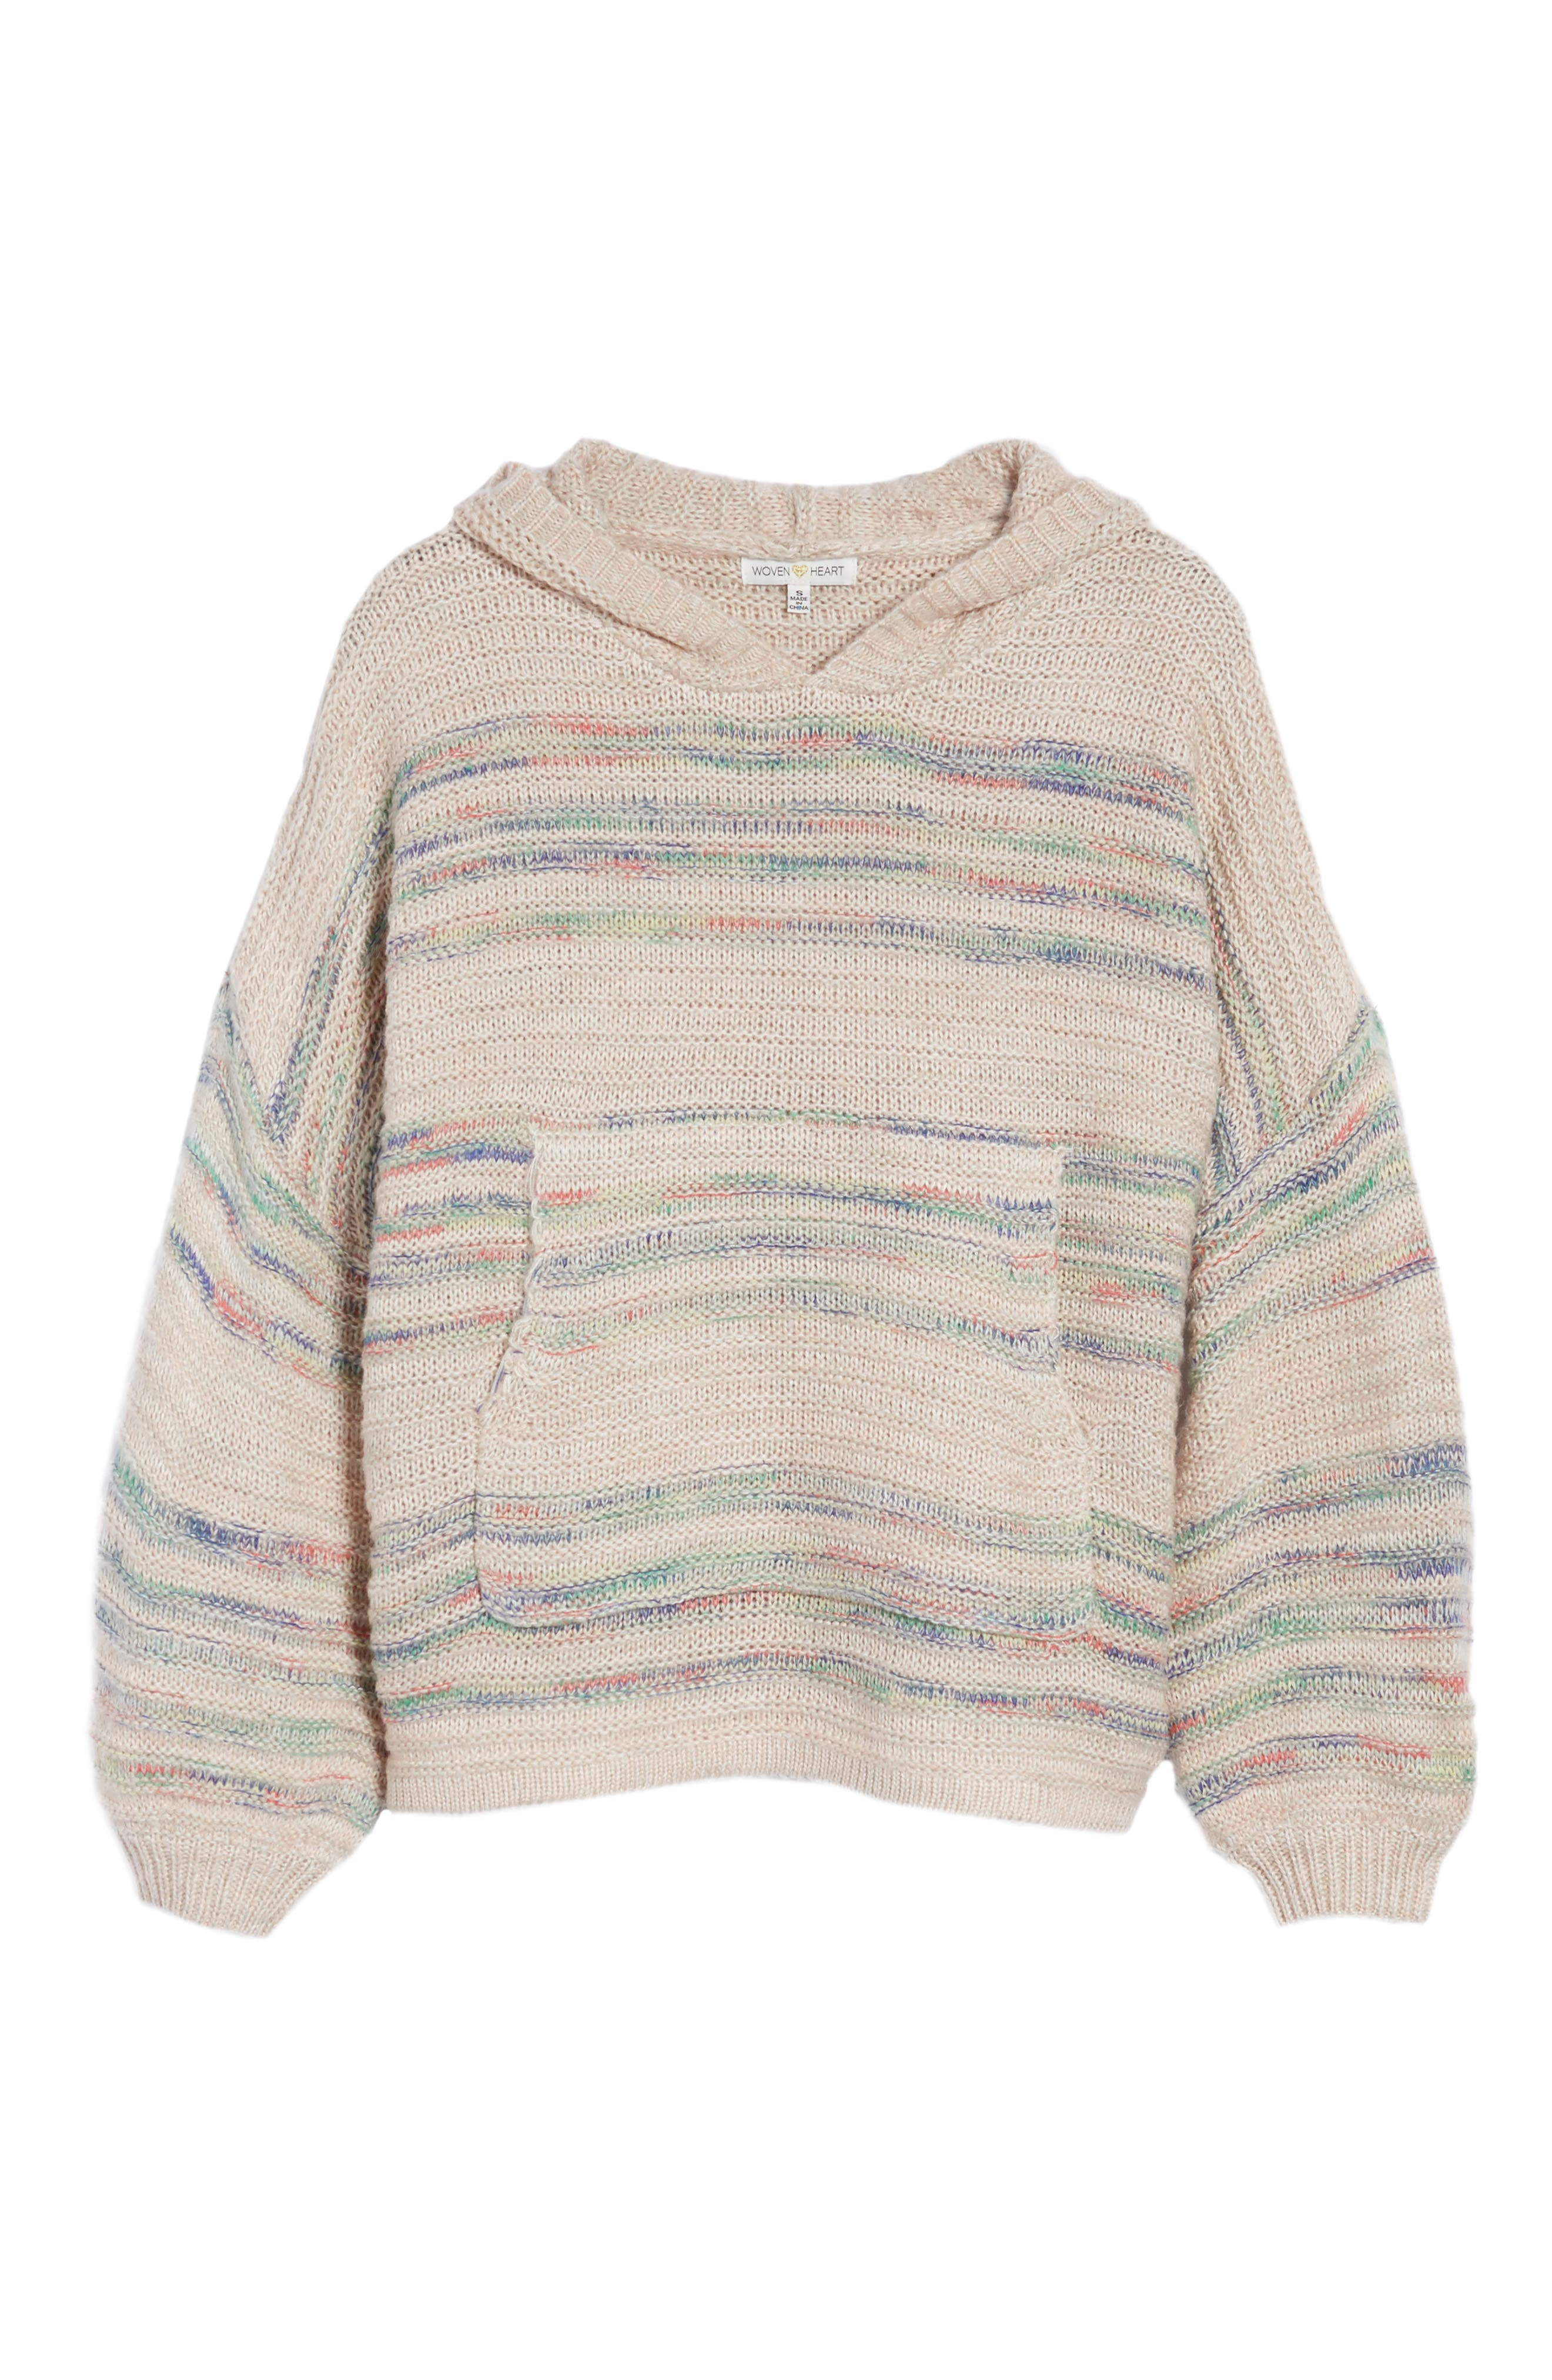 Oversized Sweater Knit Hoodie,                             Alternate thumbnail 6, color,                             Multi Yarn